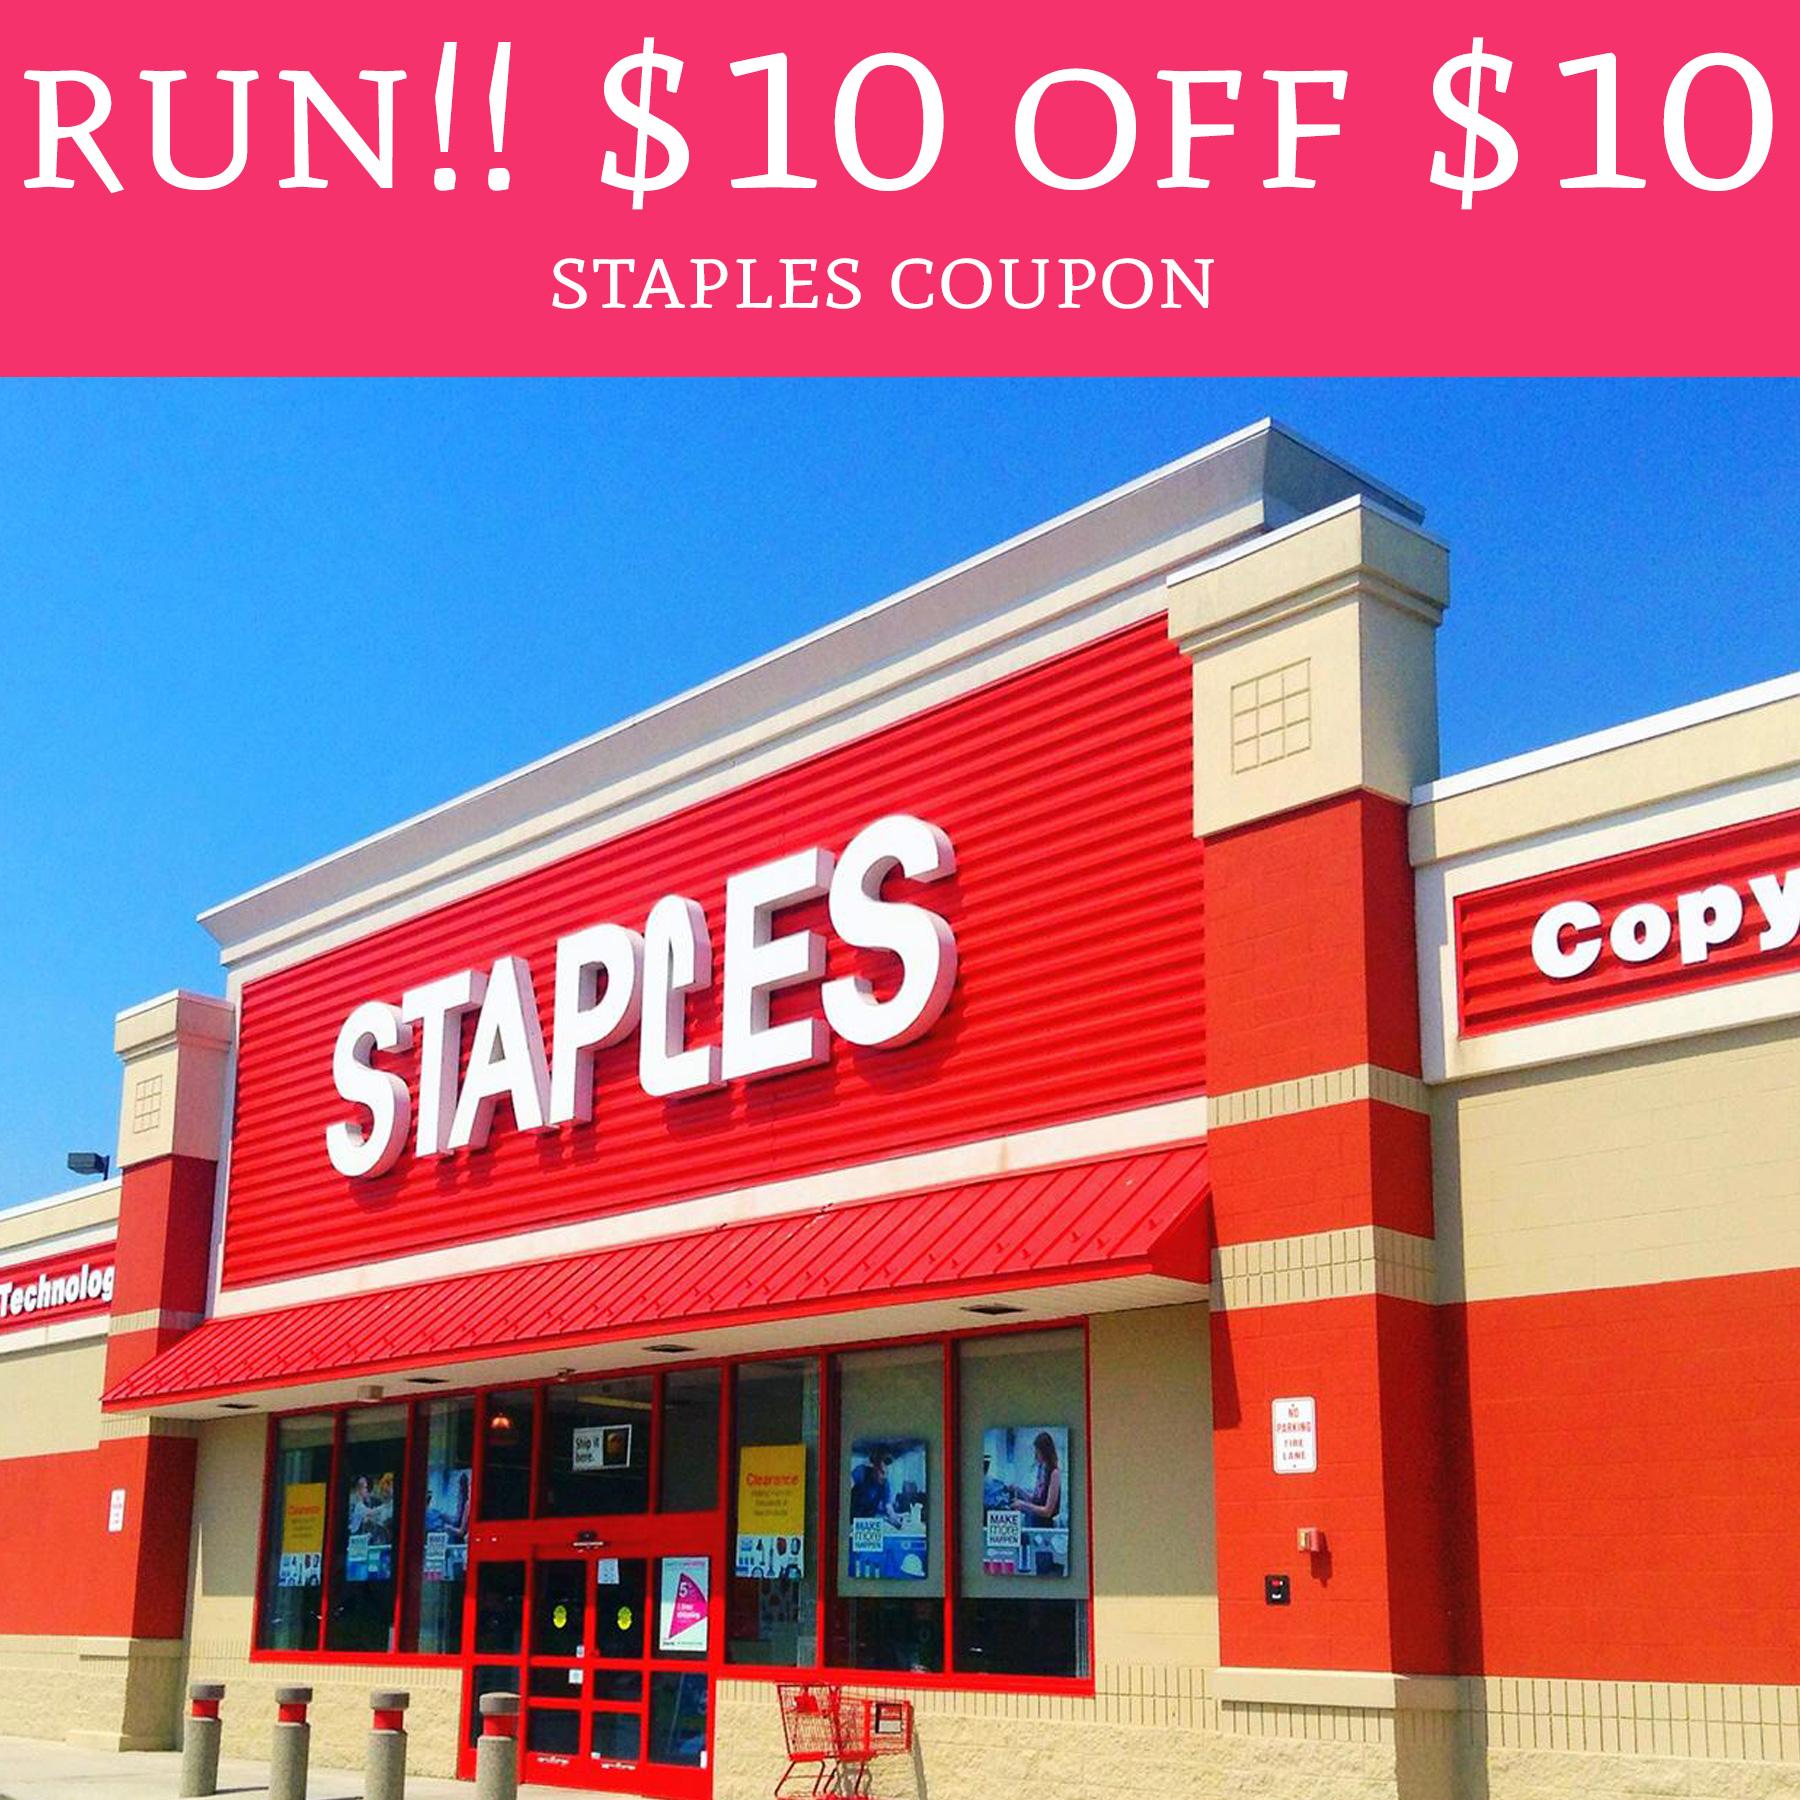 run   10 off  10 staples coupon   free stuff